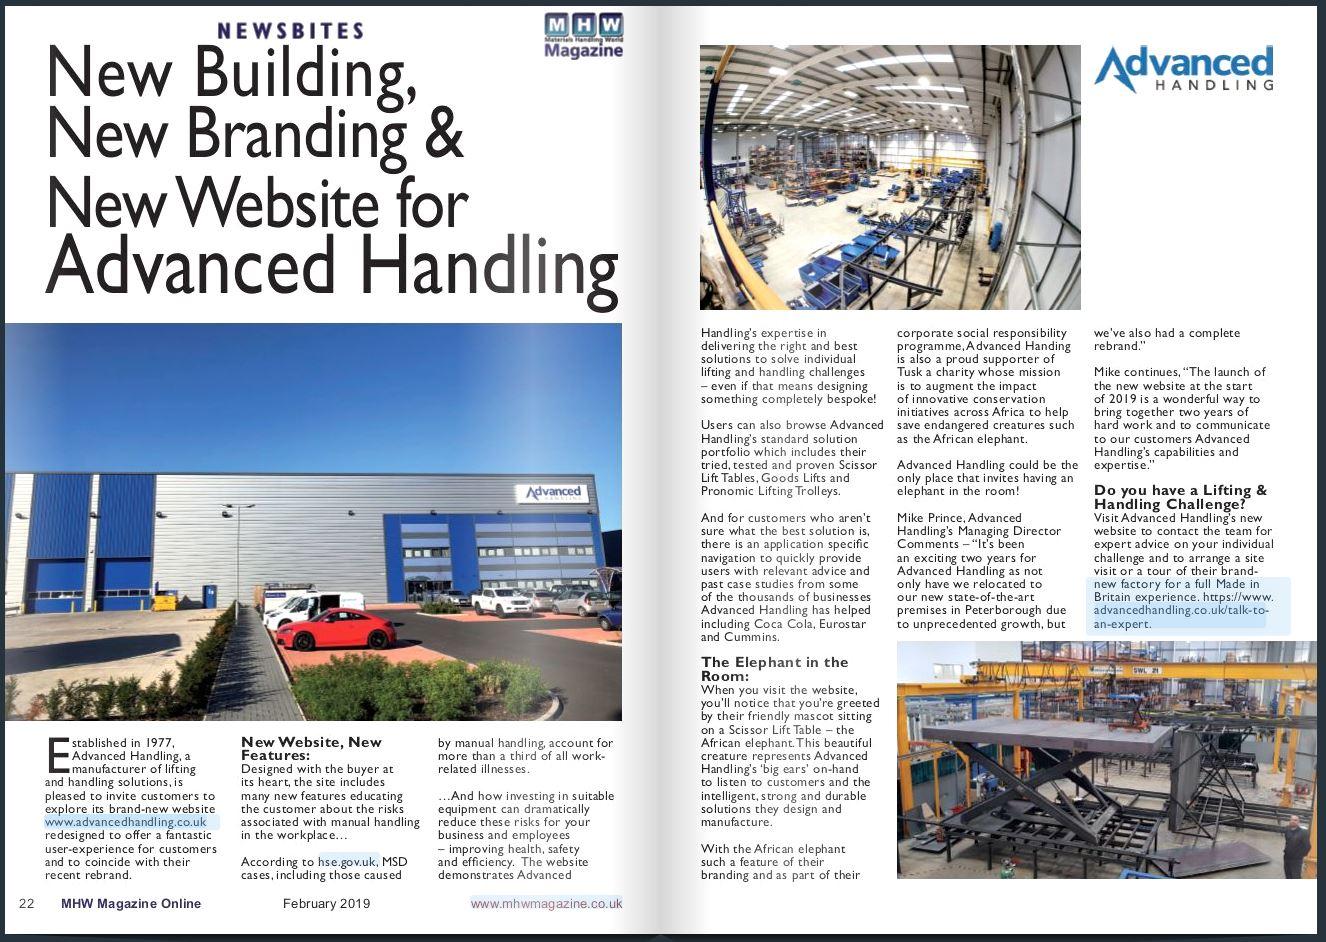 MHW Magazine AH press release